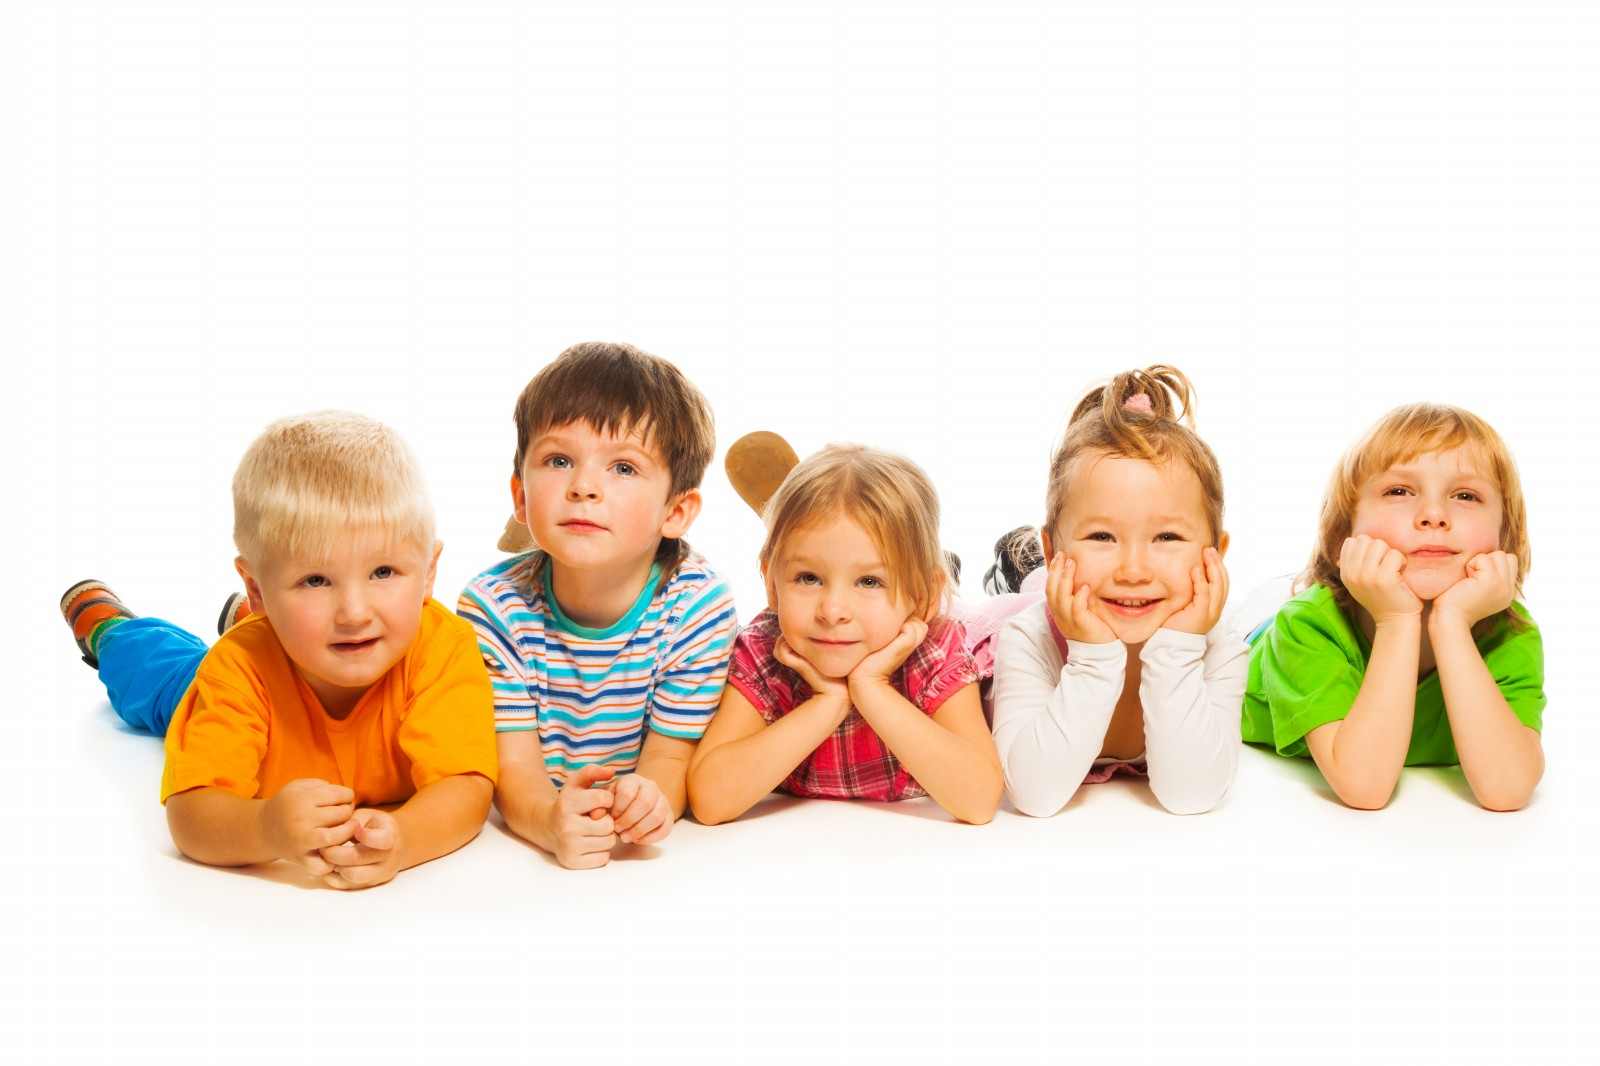 five little kids - Images Of Little Kids